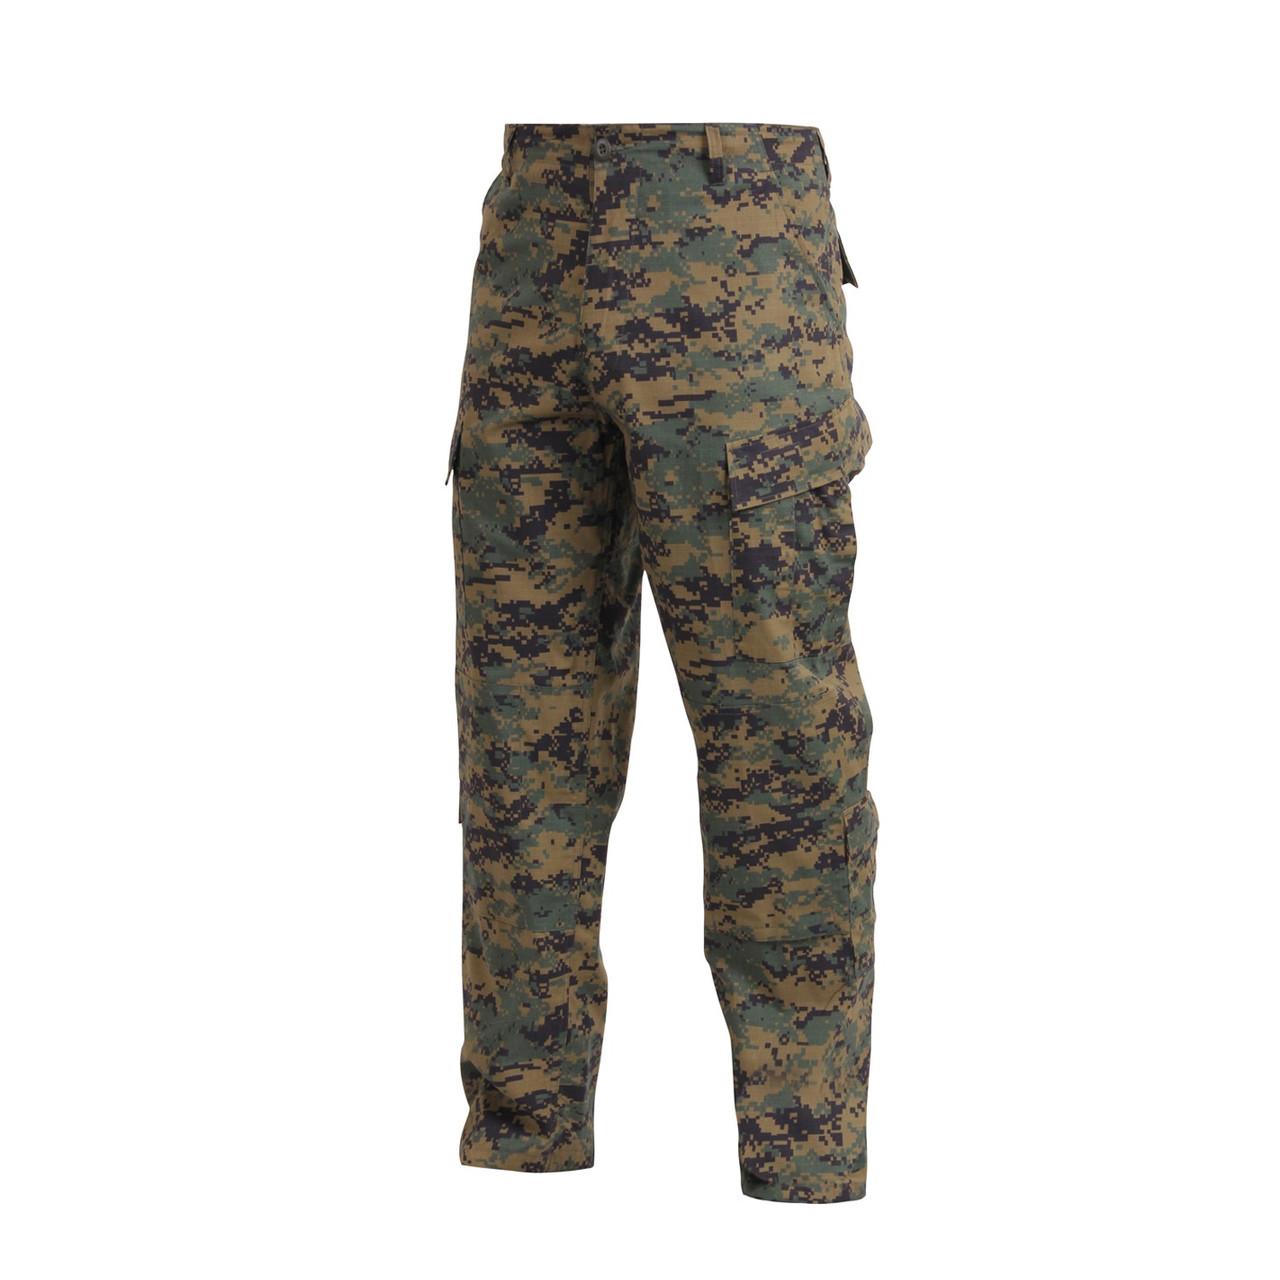 Woodland Digital Camo Trousers